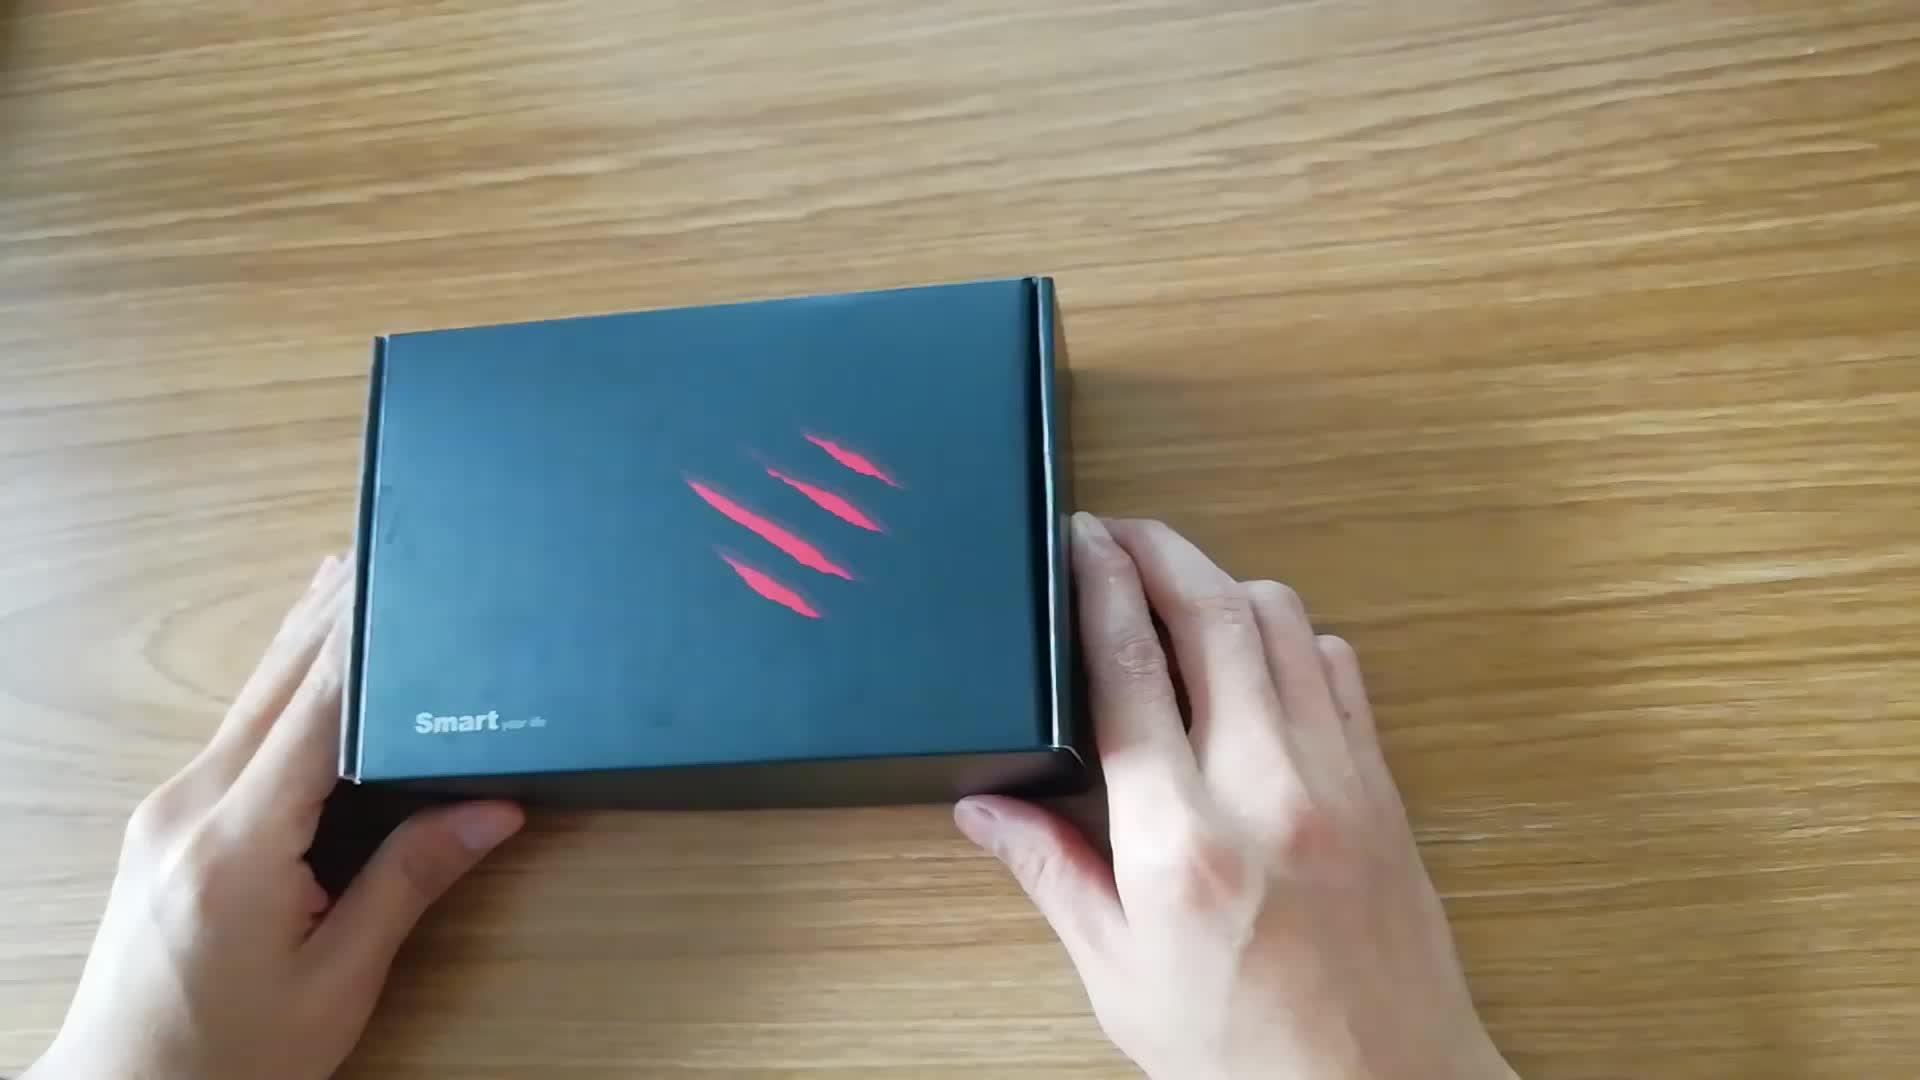 factory directly new amlogic s905w smart tv box tx3 mini 2gb 16gb android tv box